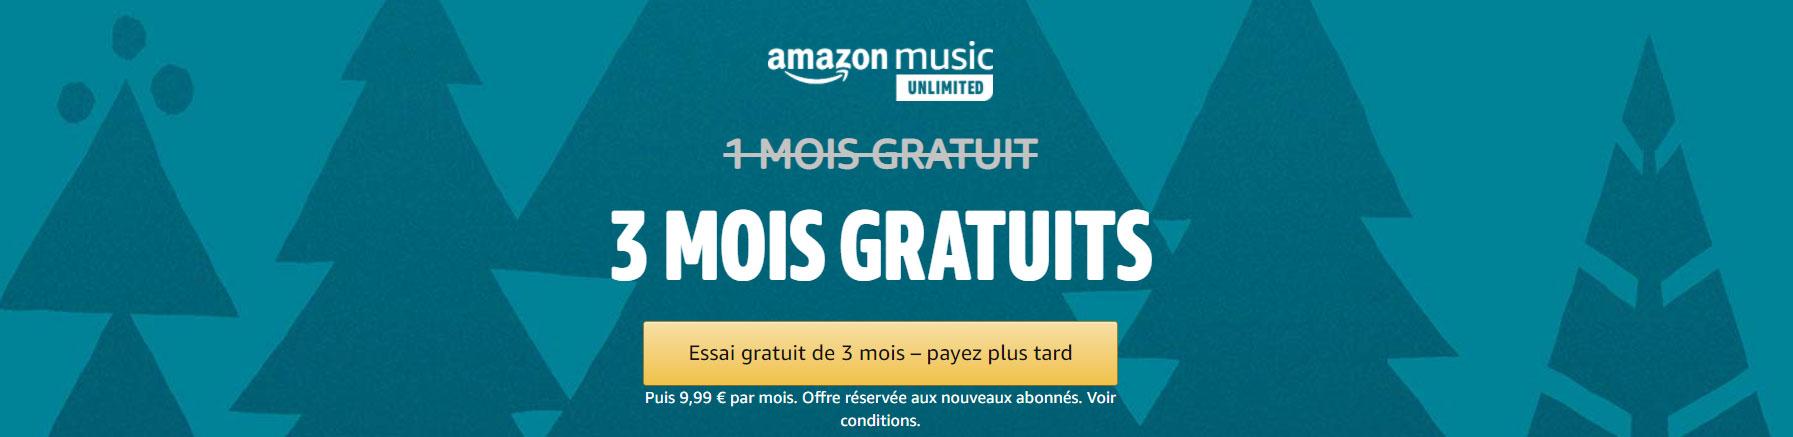 amazon-music-deal